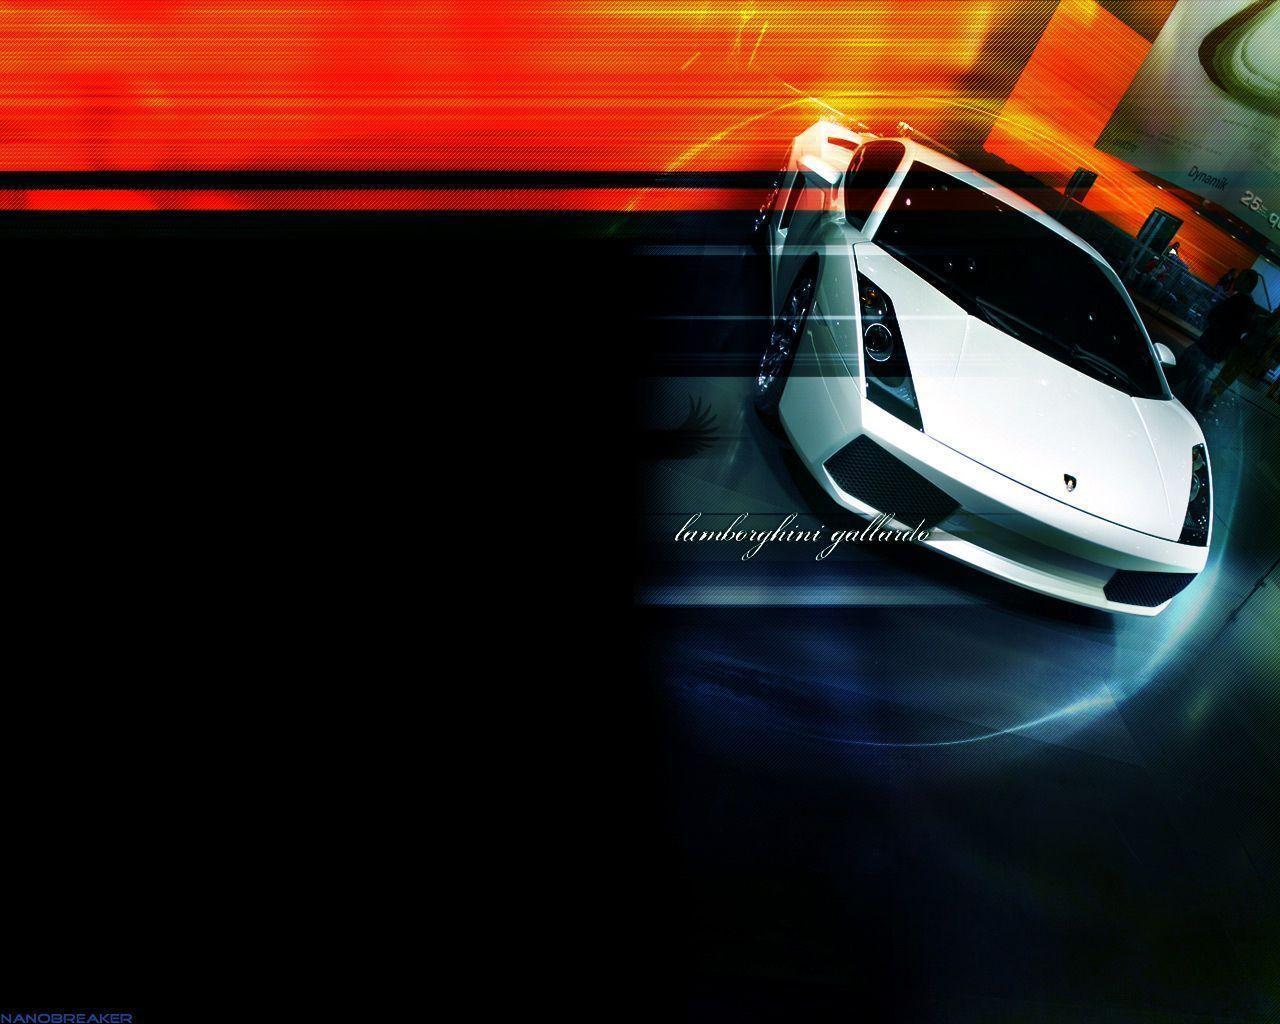 Cool Lamborghini Backgrounds wallpaper 84410